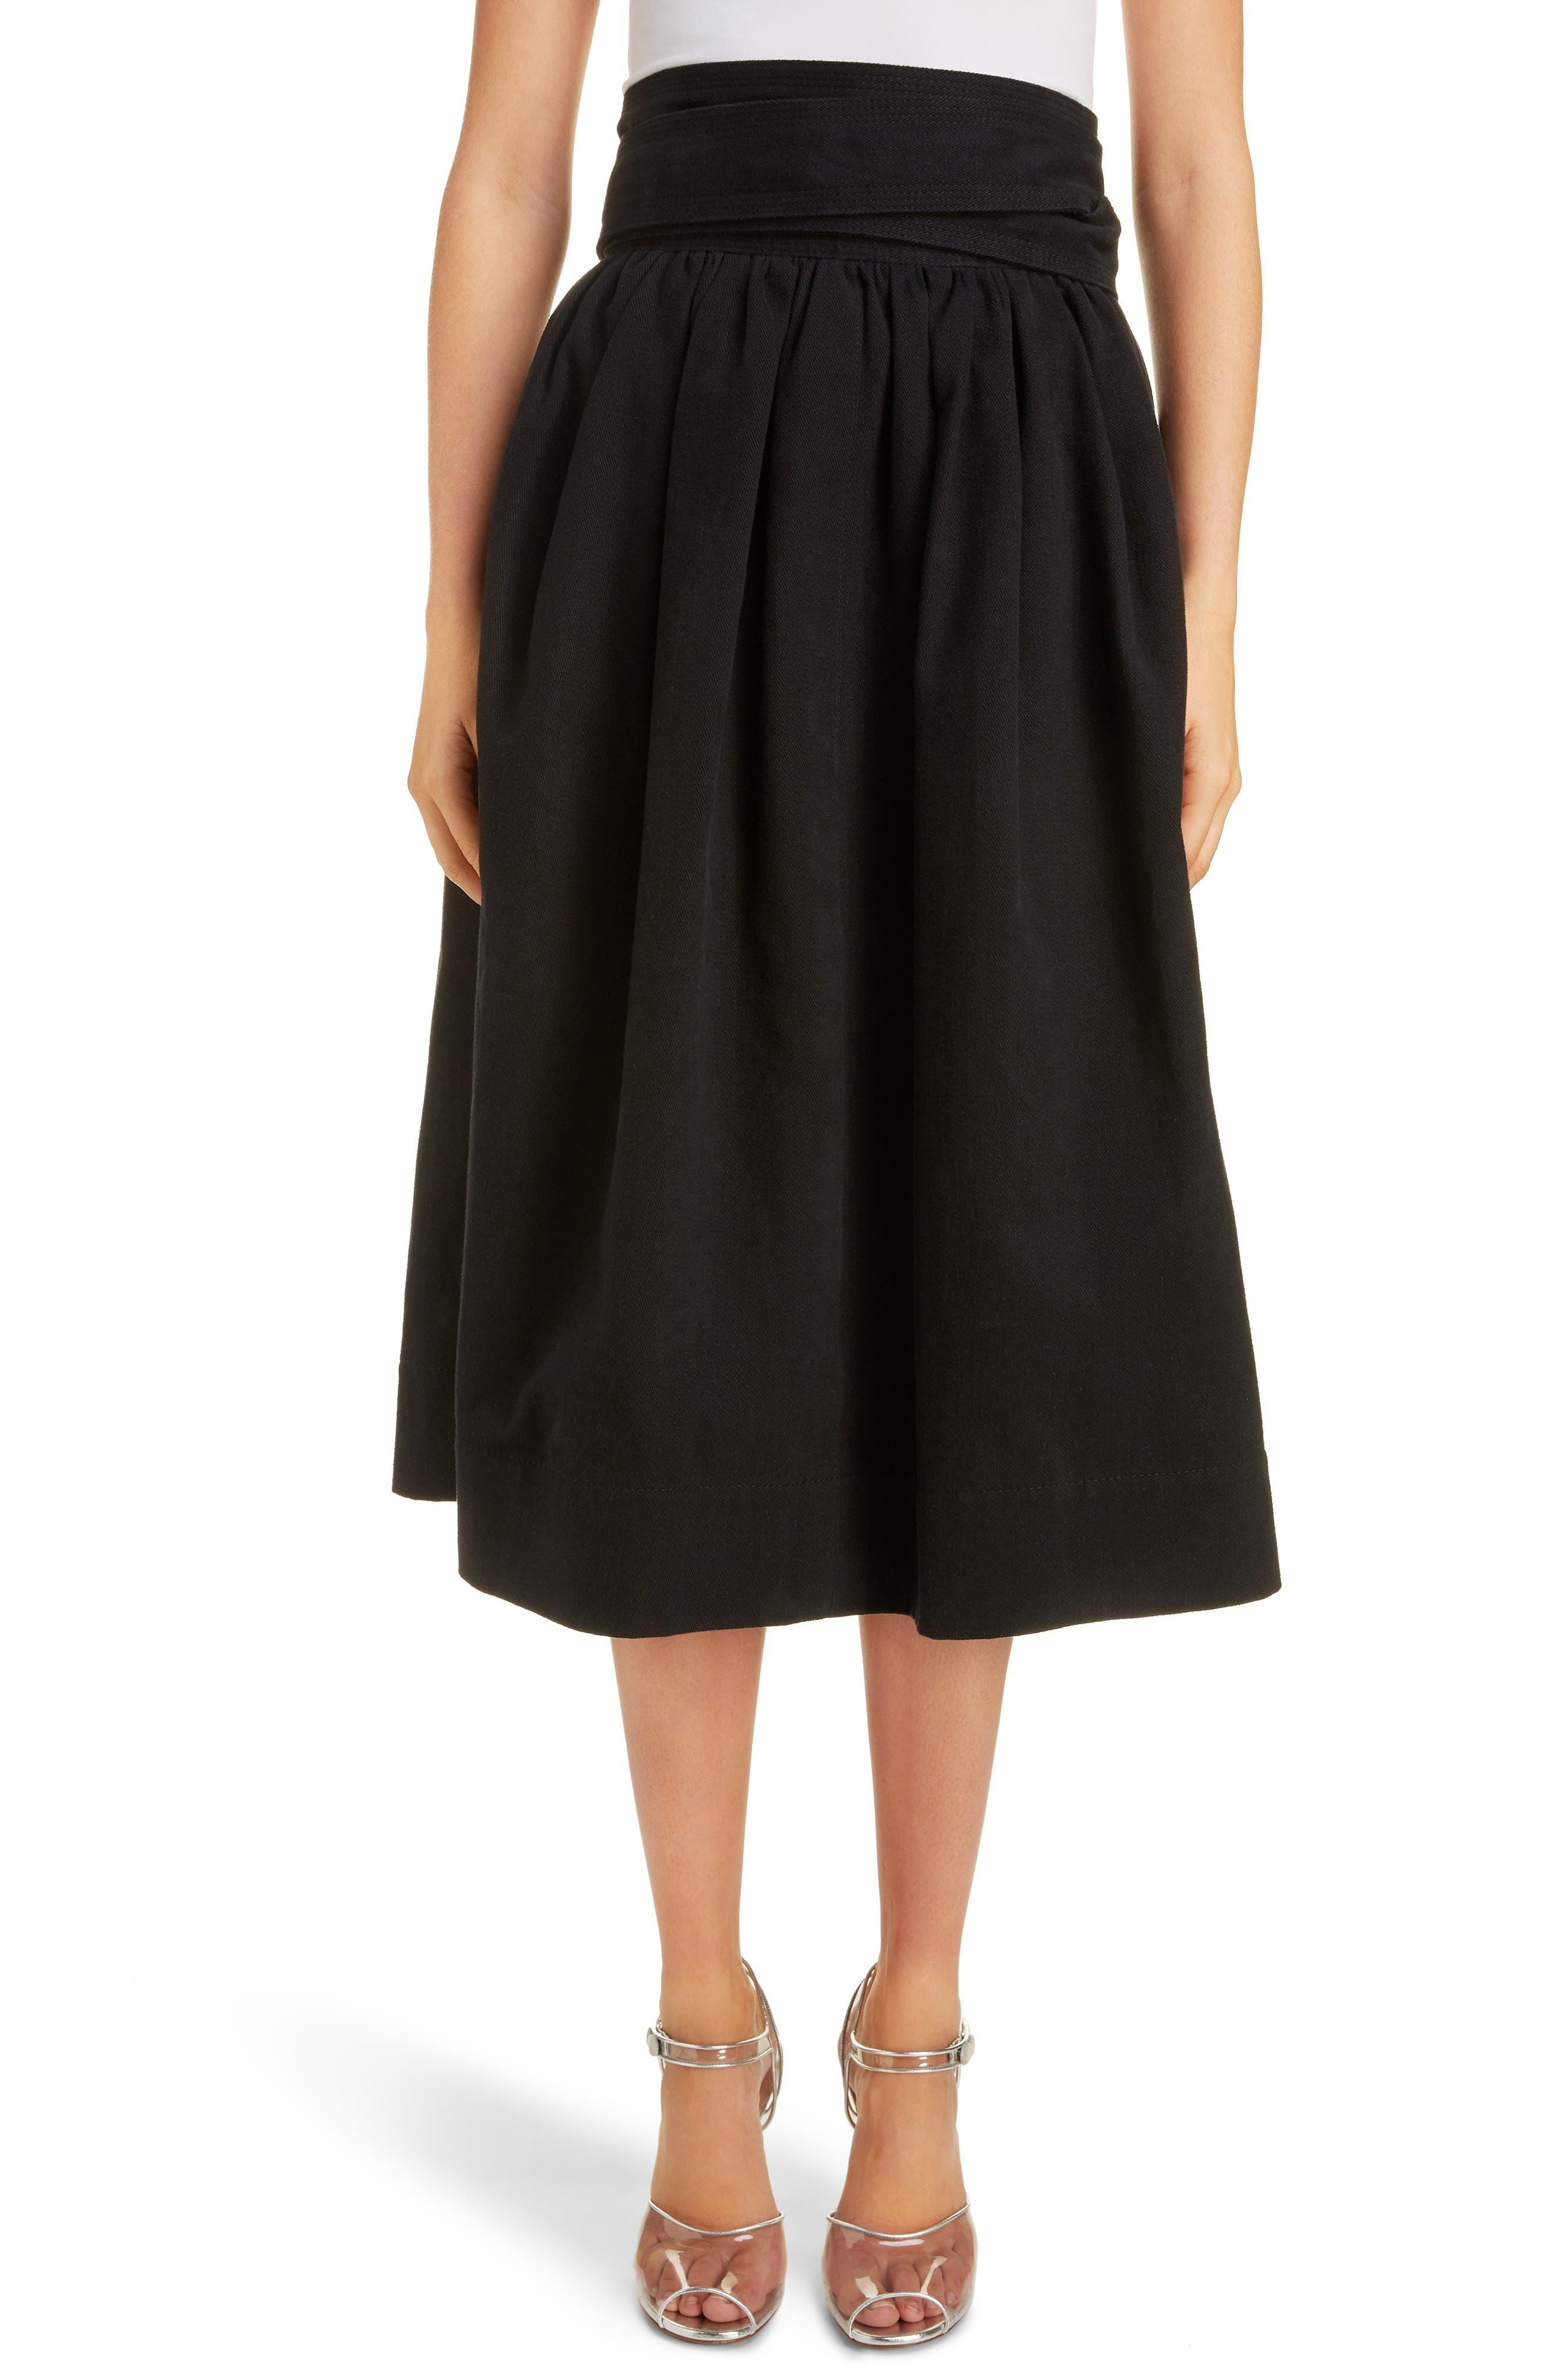 Marc Jacobs Skirts High Waist Denim Skirt